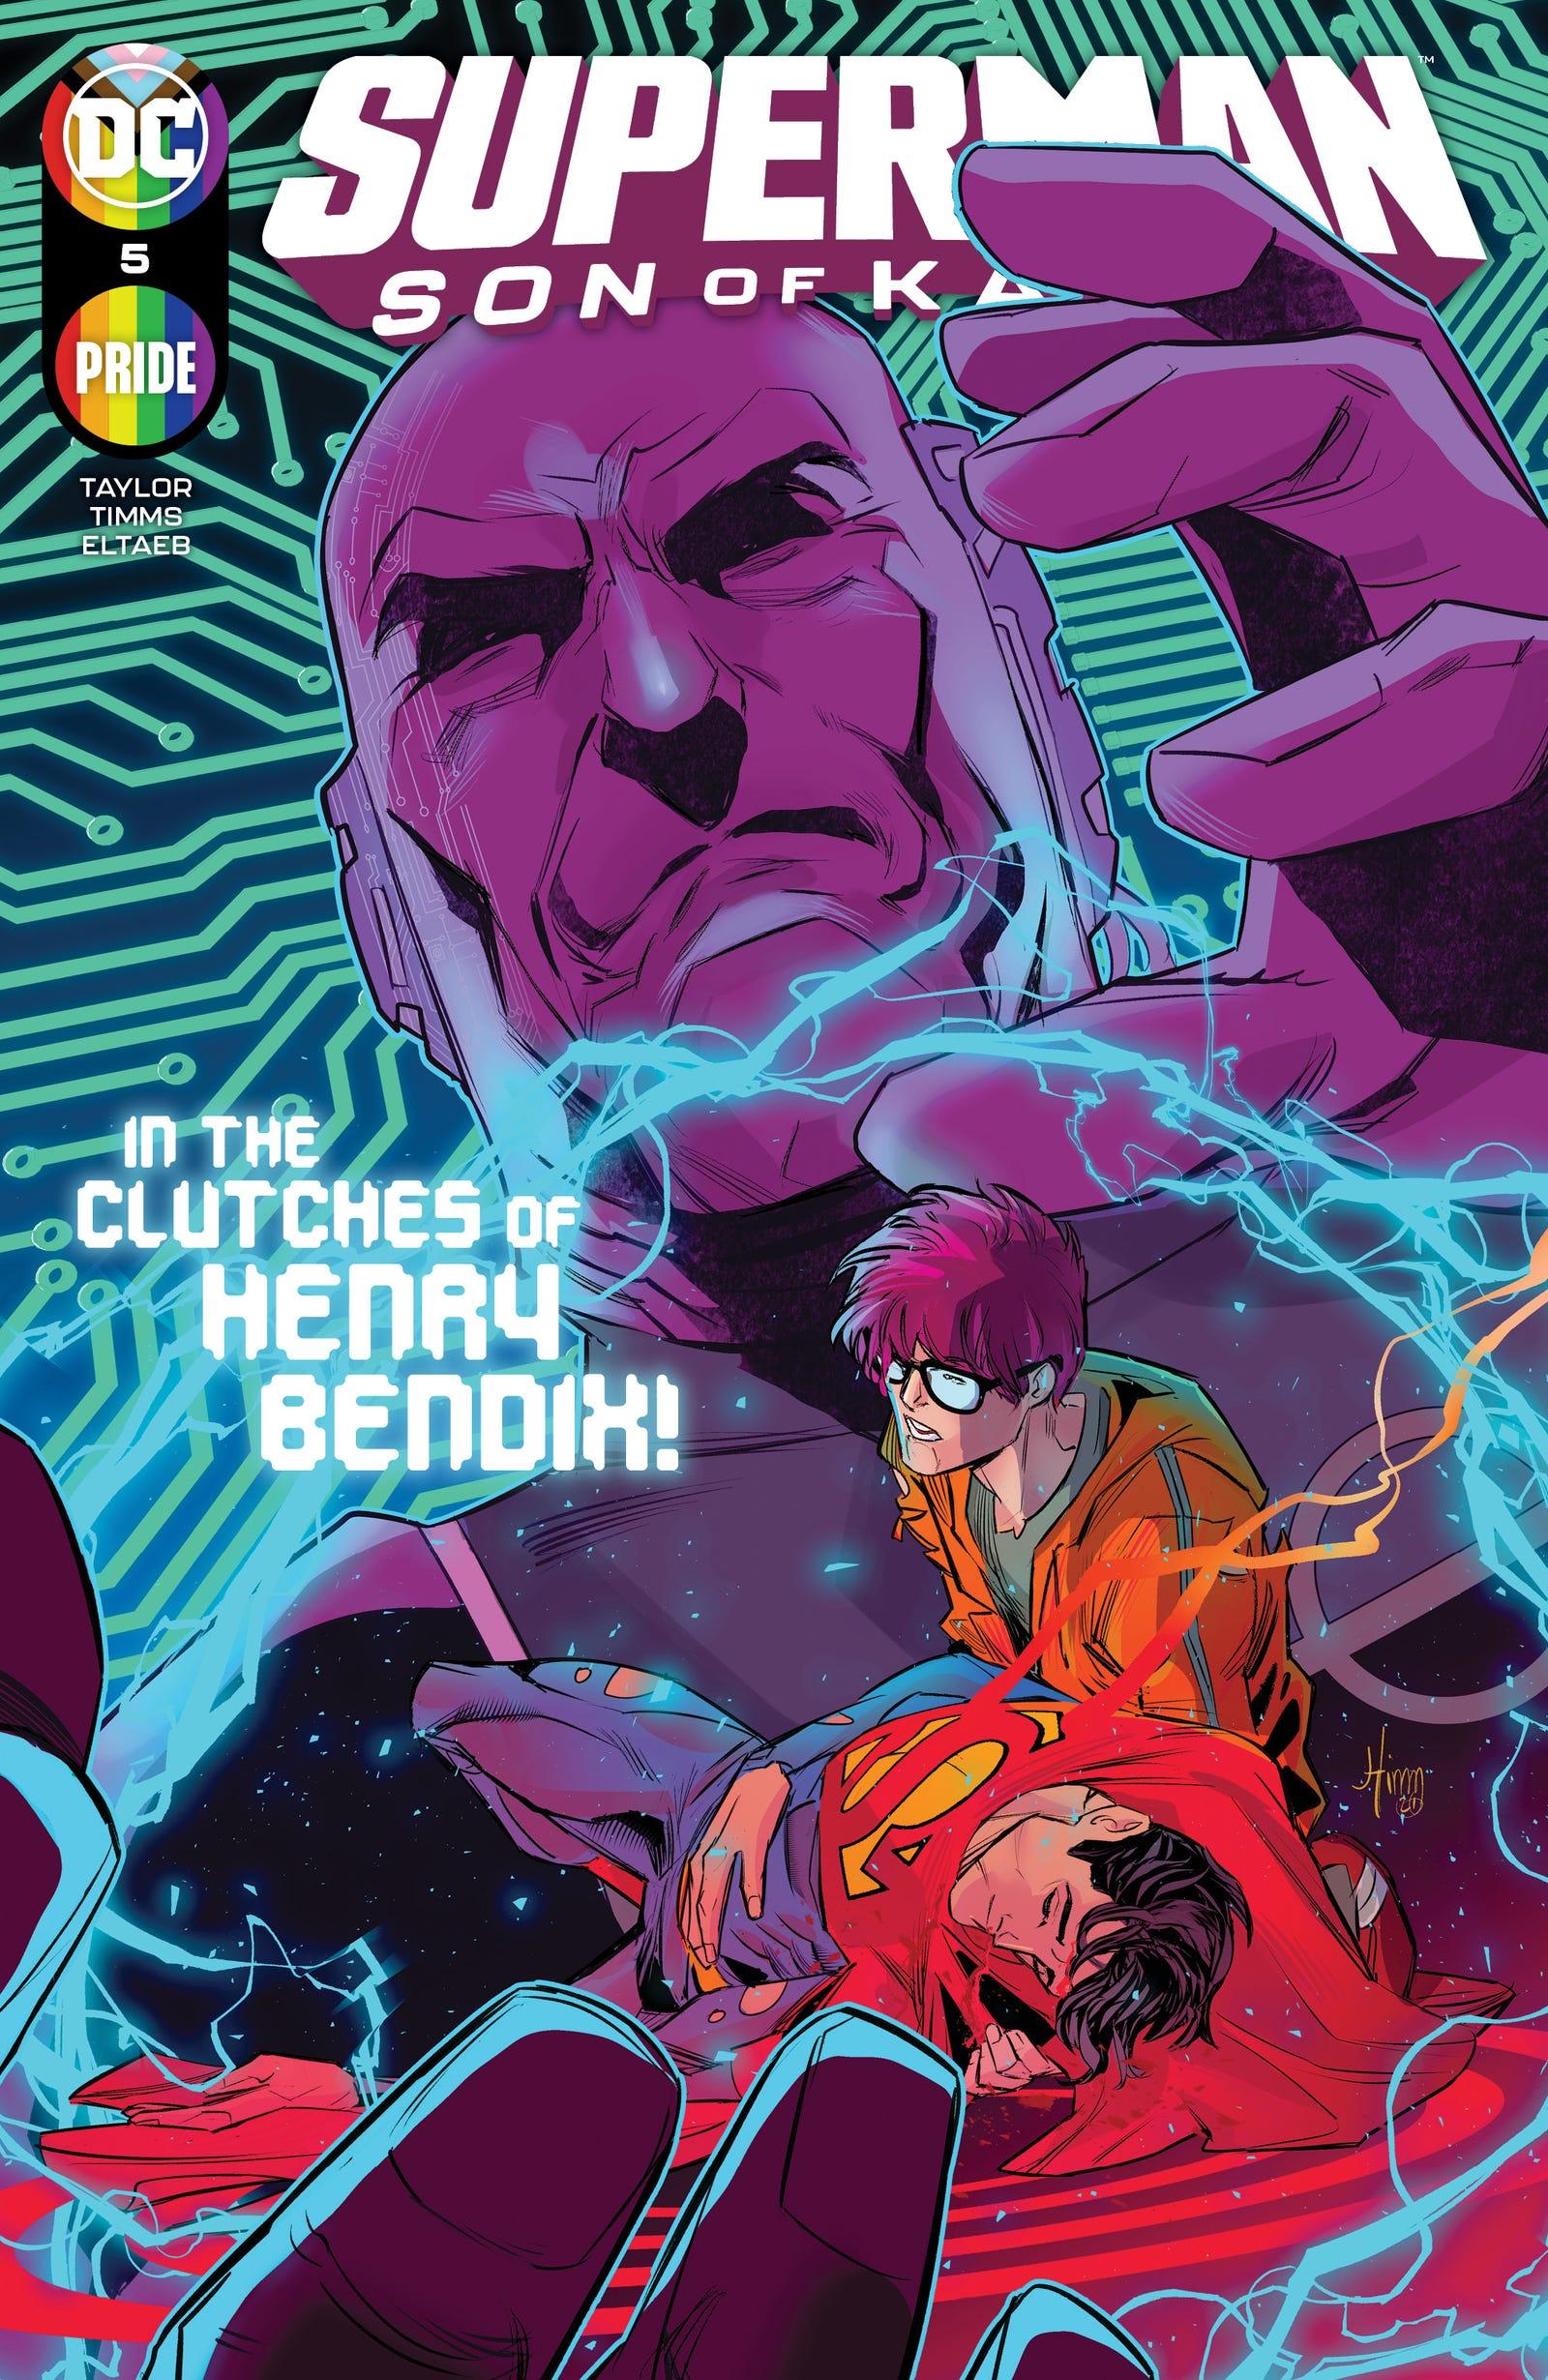 DC's current Superman is bisexual: Meet his love interest 14